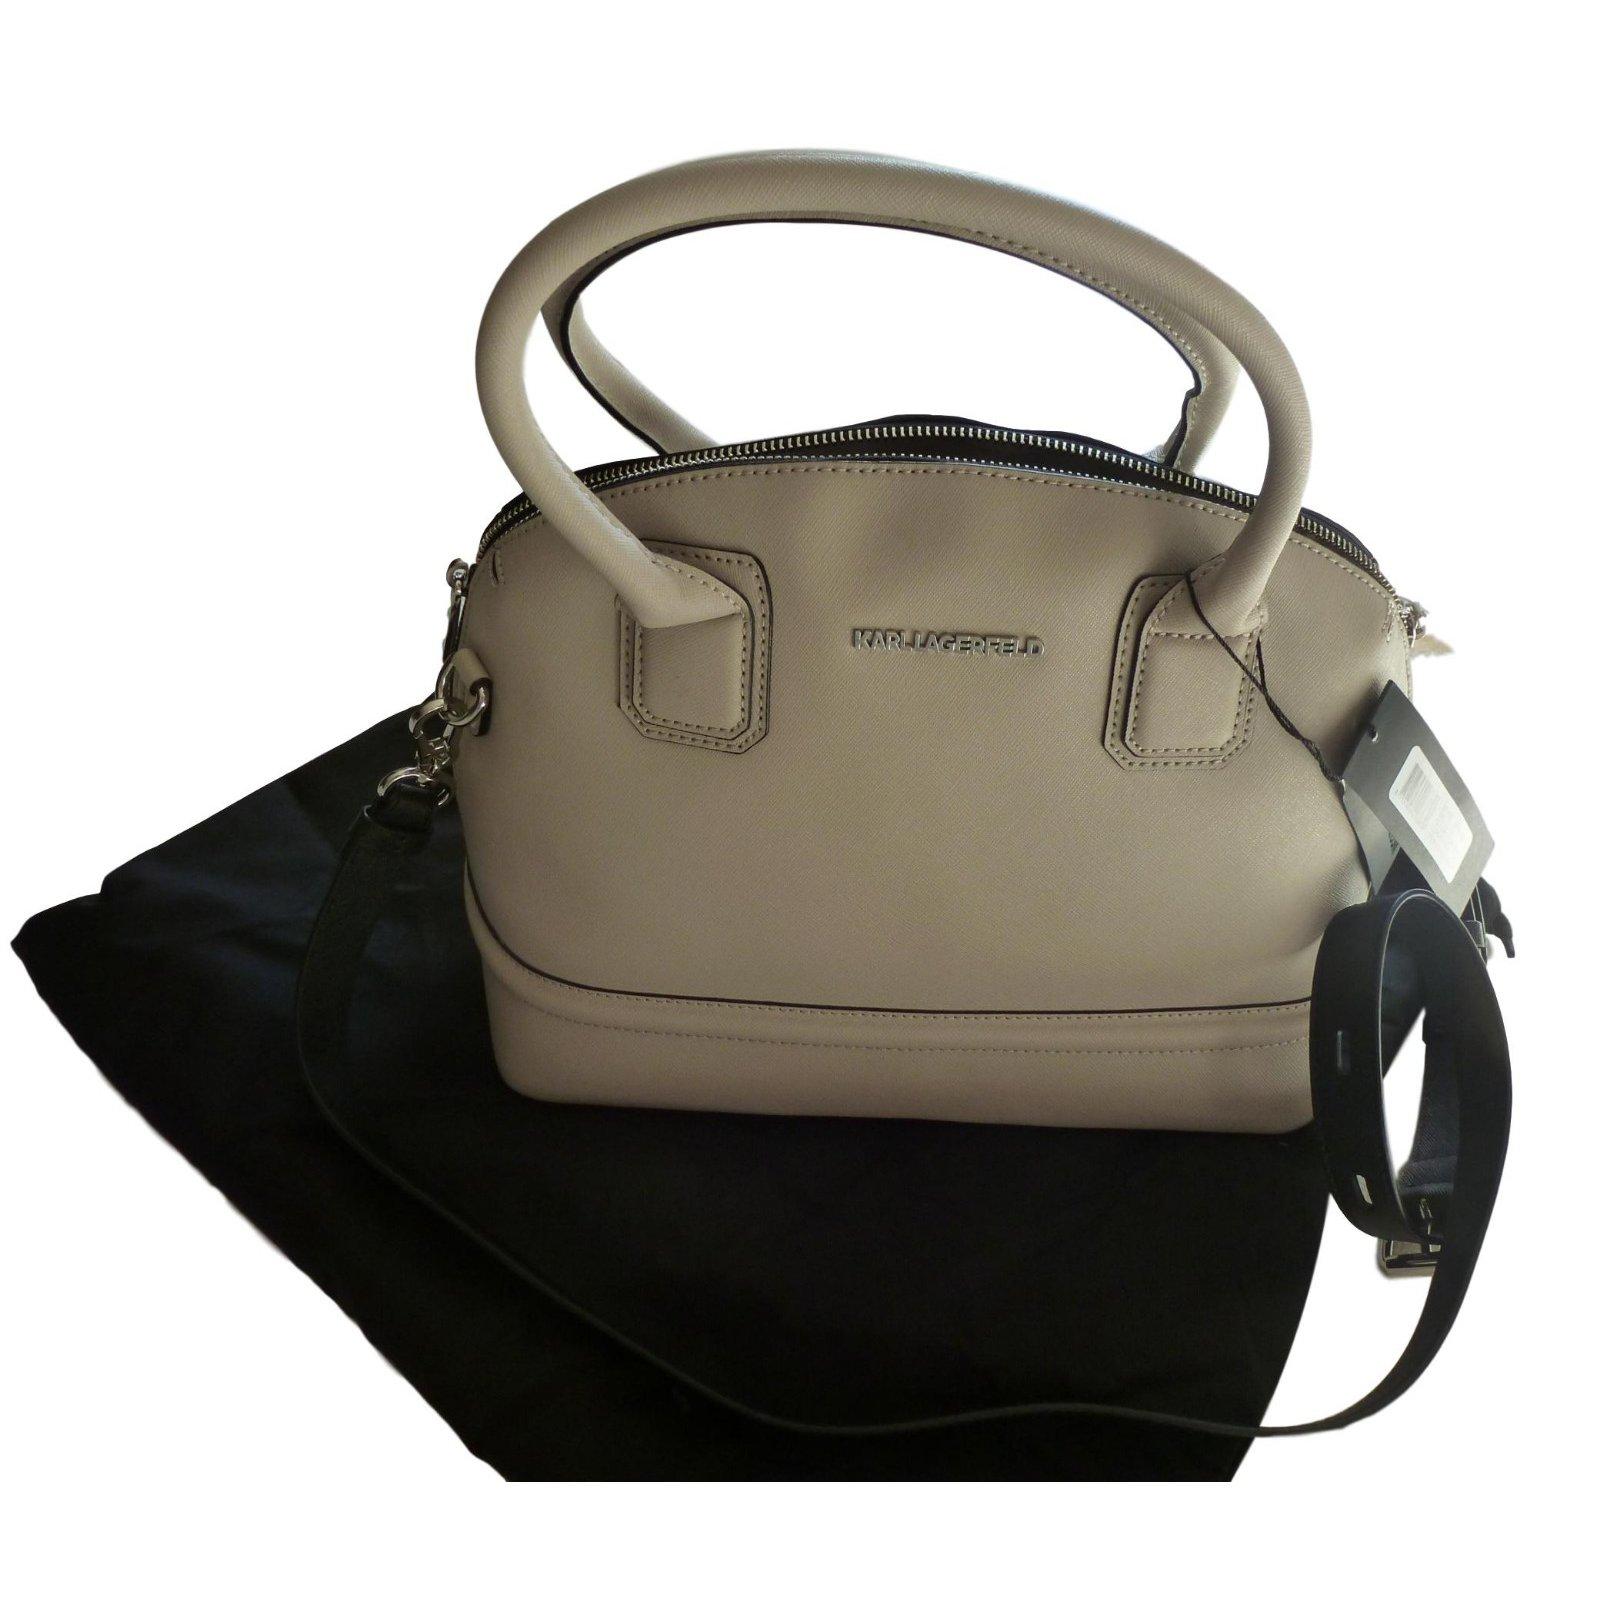 Karl Lagerfeld Handbags Handbags Leather Cream Ref68450 Joli Closet